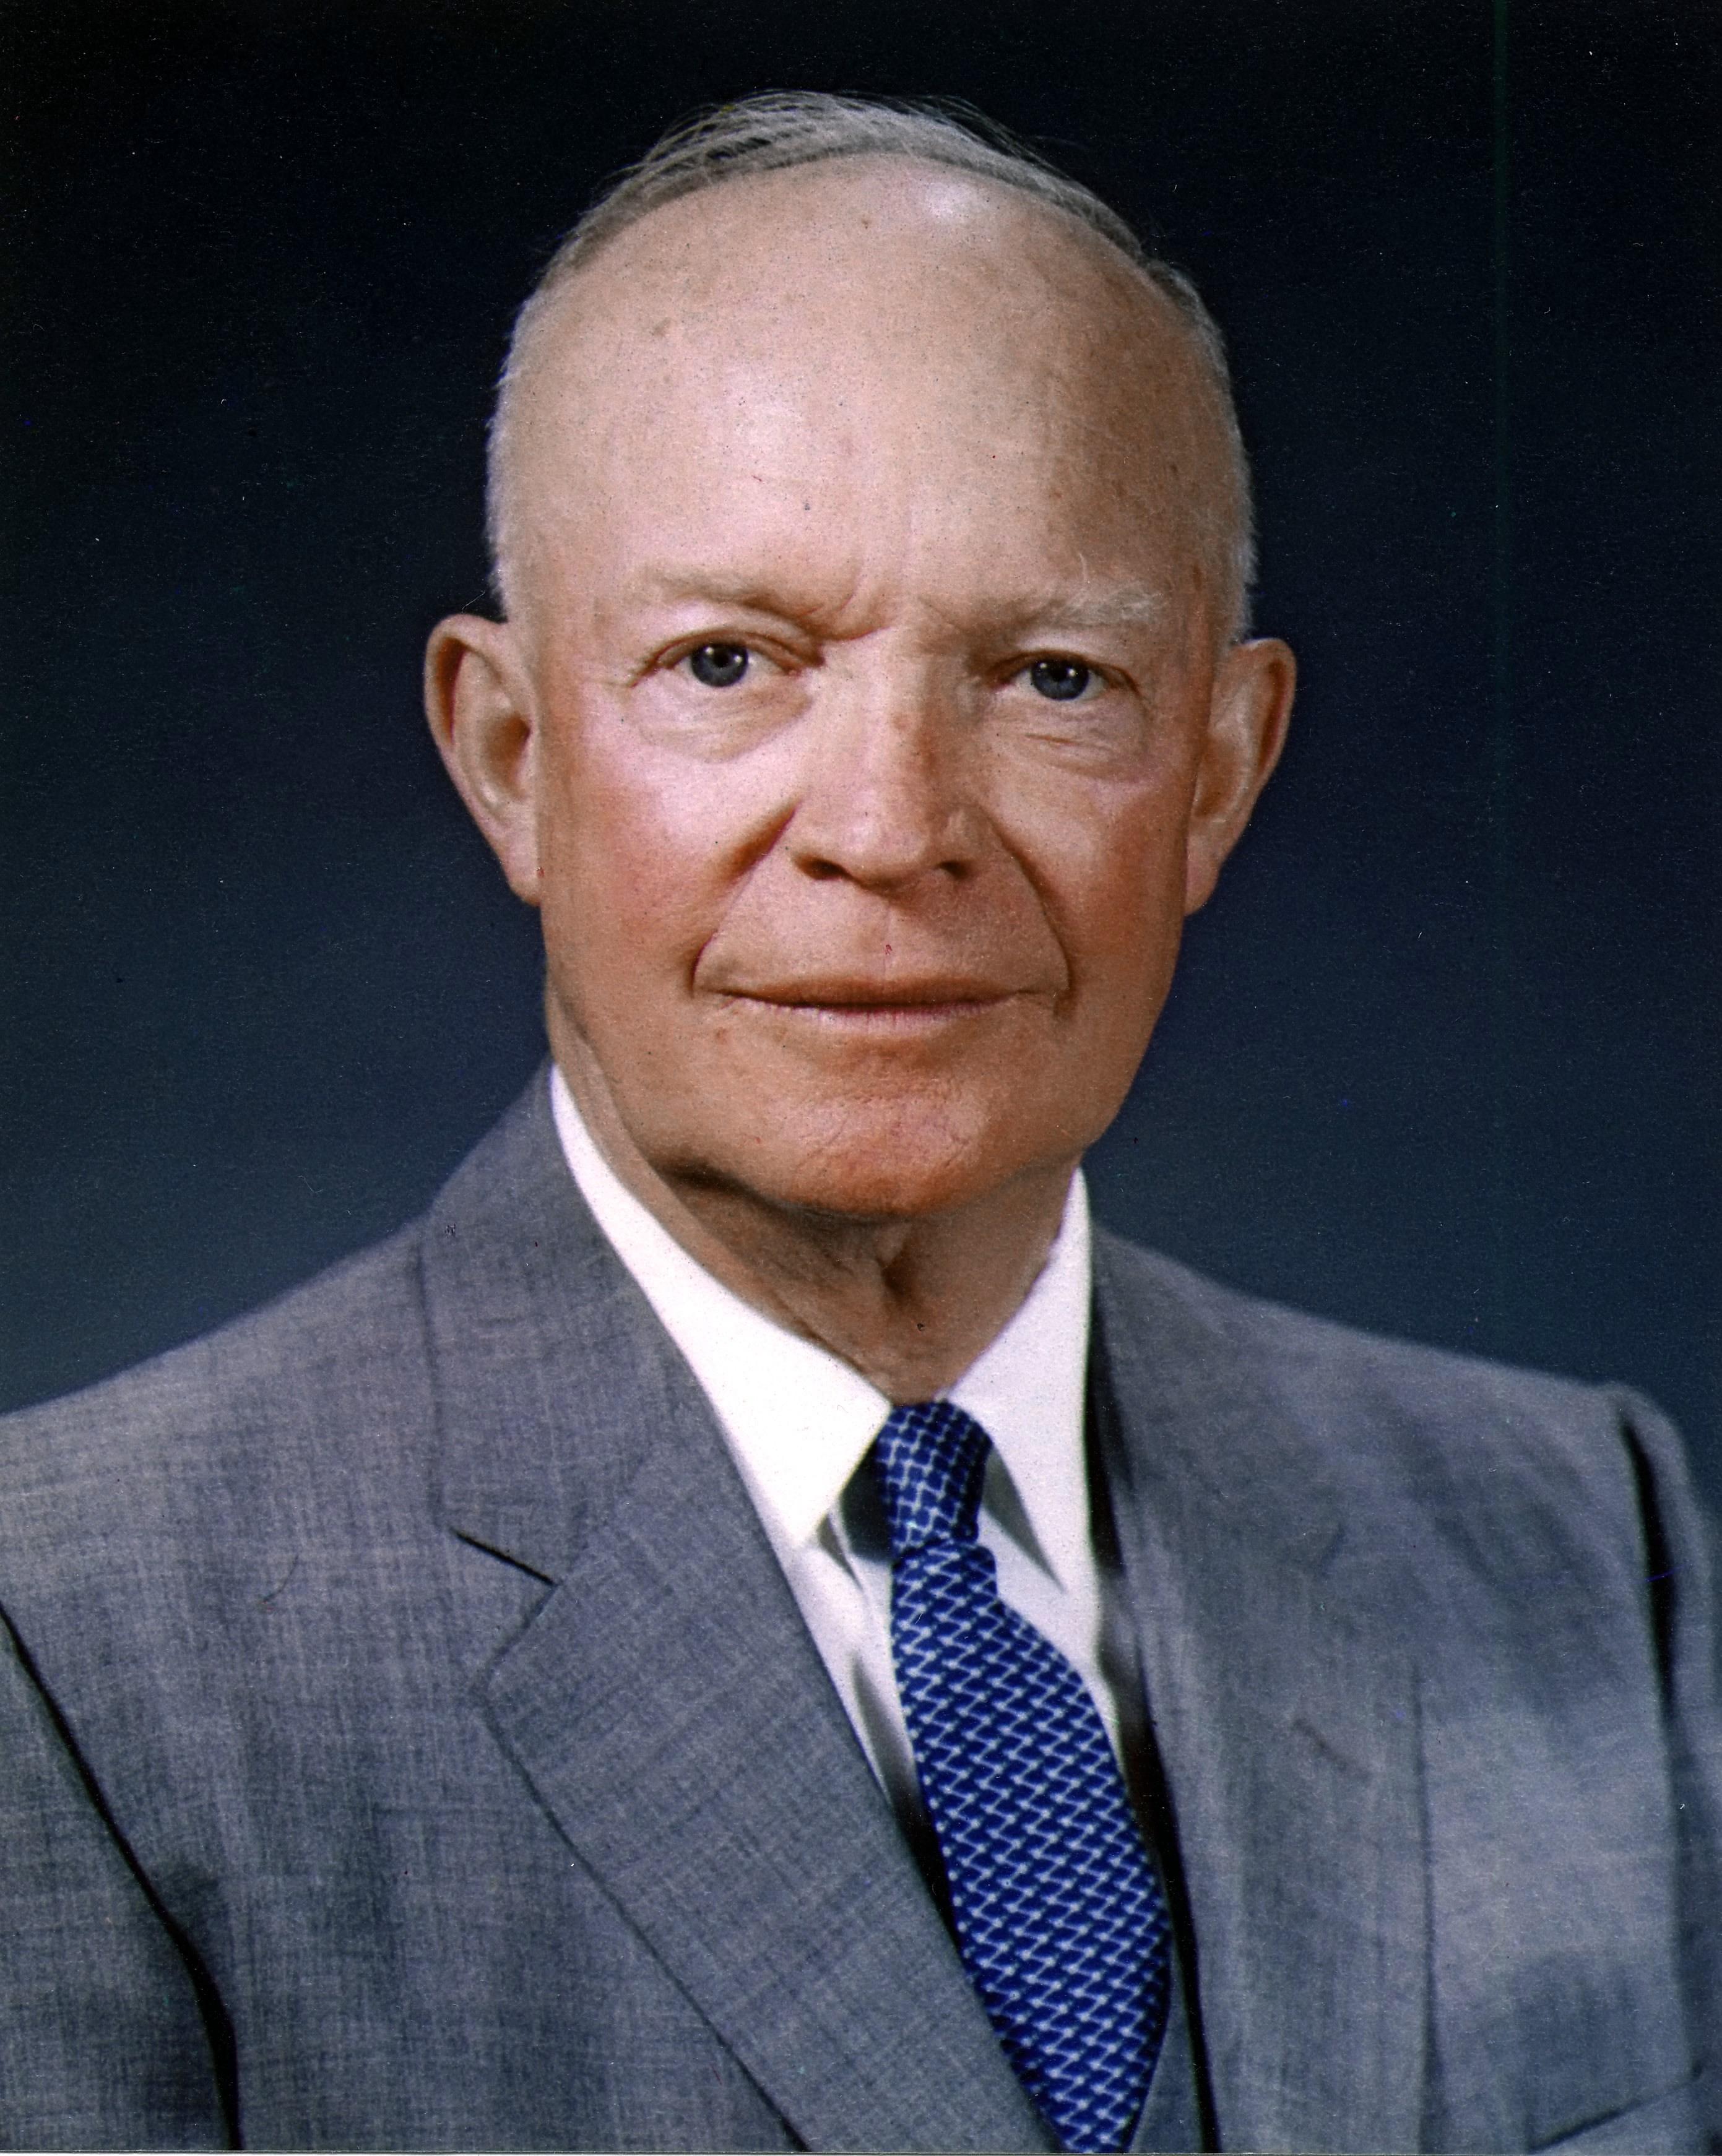 Dwight_D._Eisenhower_official_photo_portrait_May_29_1959.jpg